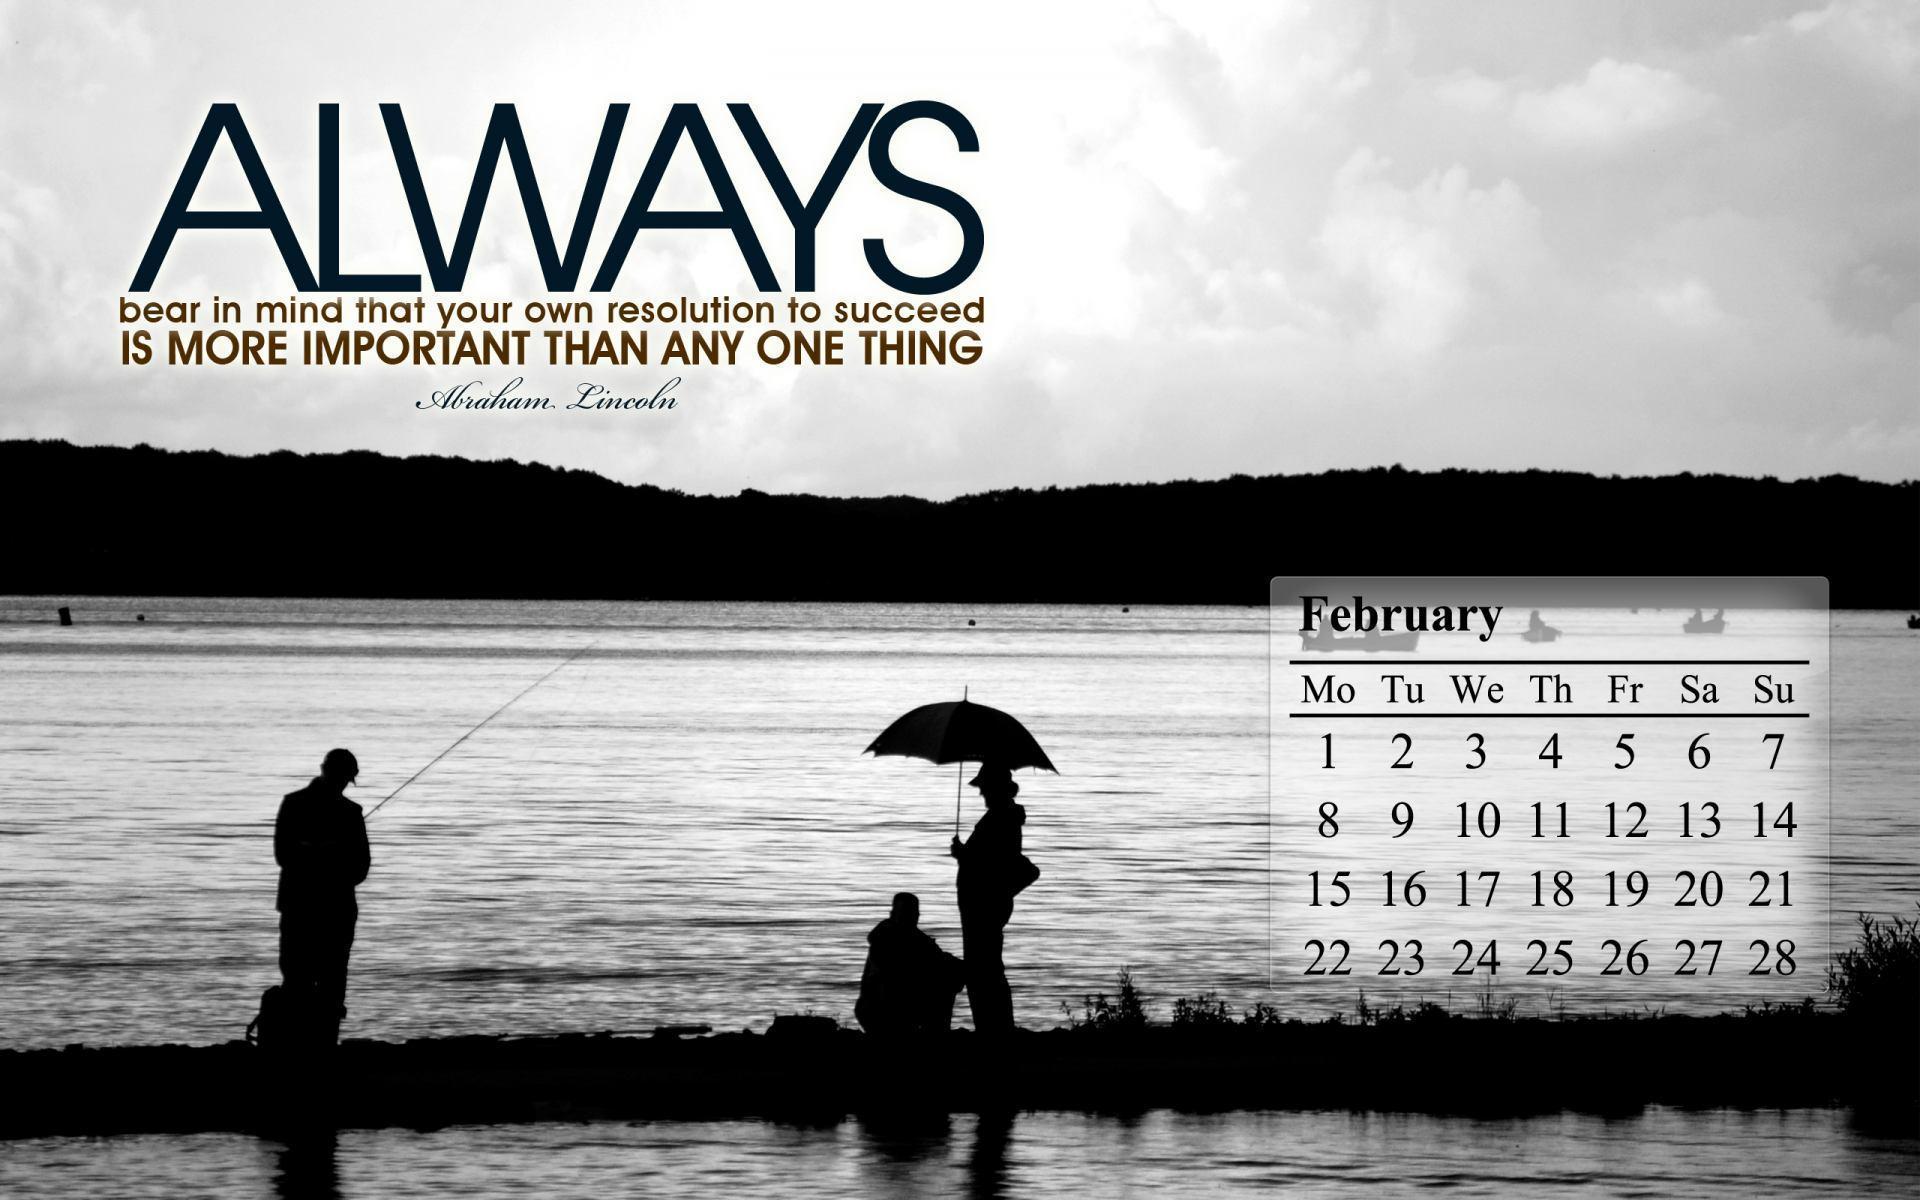 Calendar Wallpaper Quotes : February wallpapers wallpaper cave